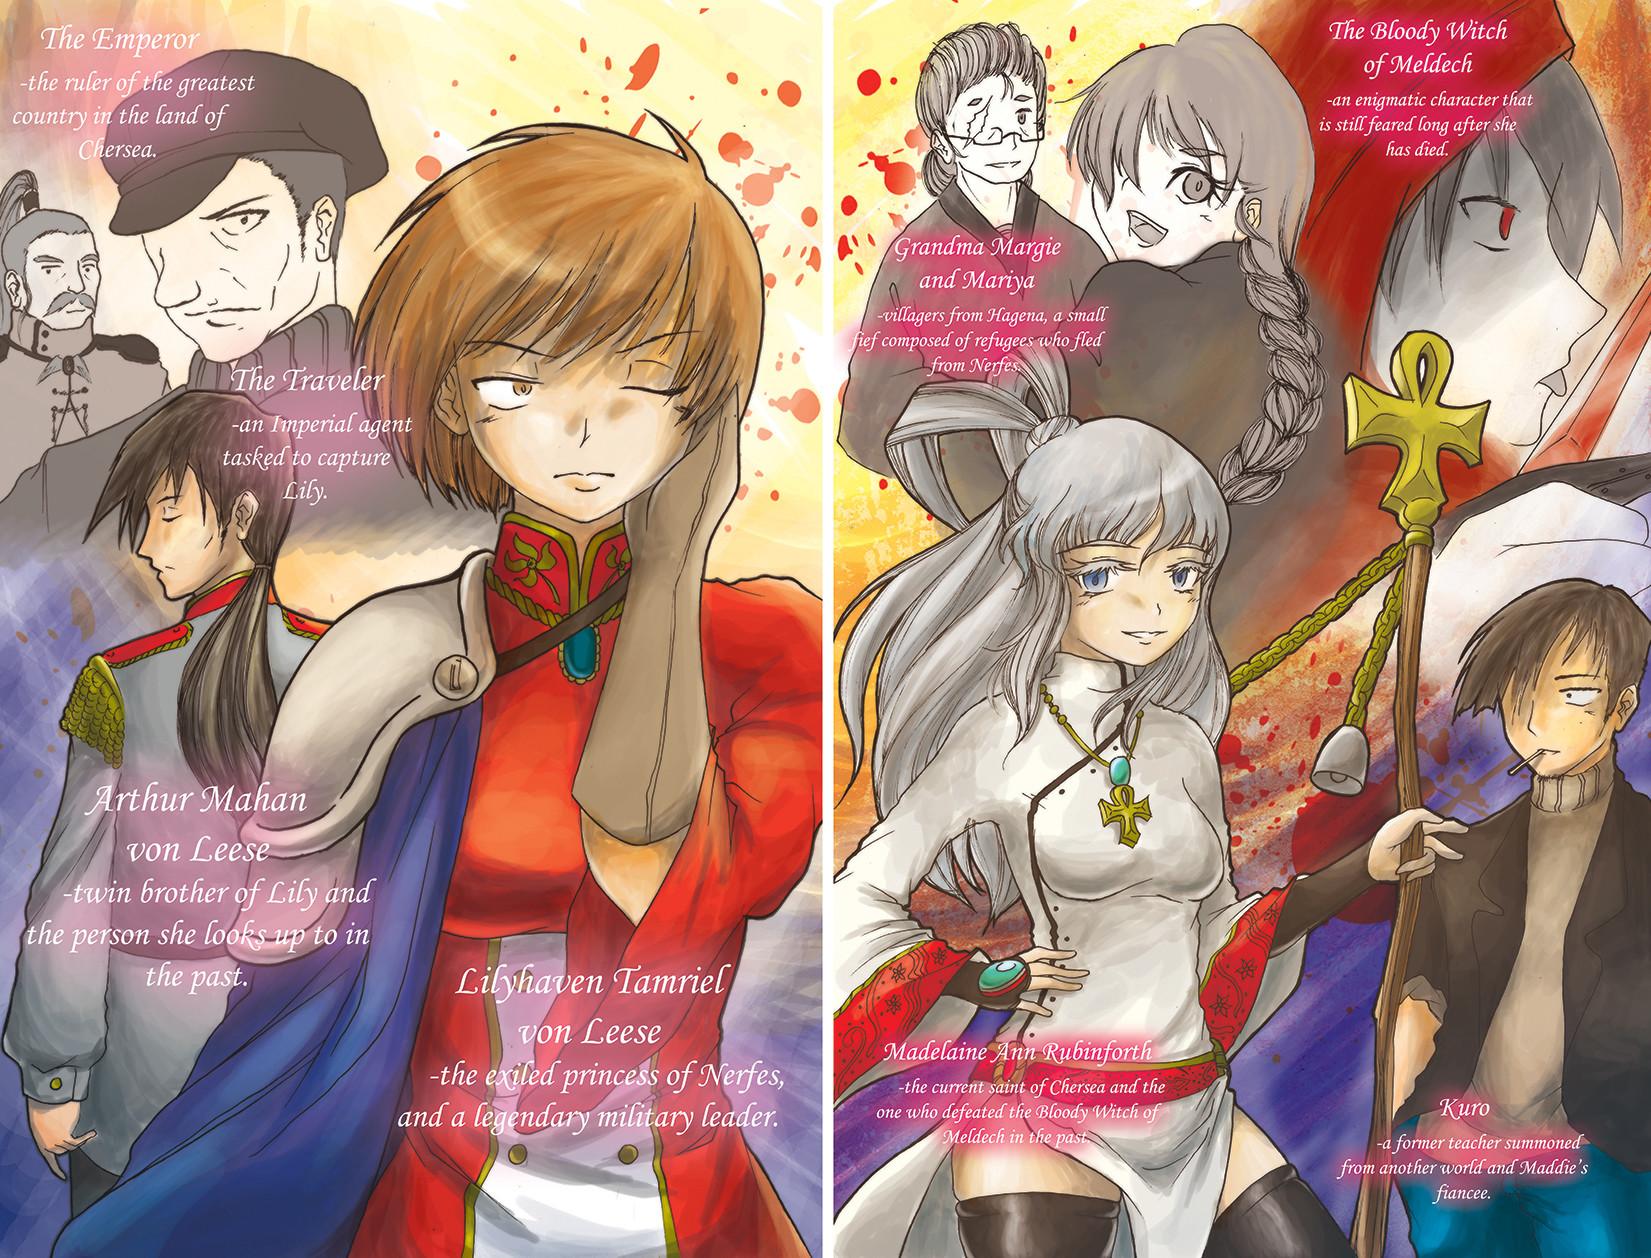 Vol. 3 Character Insert